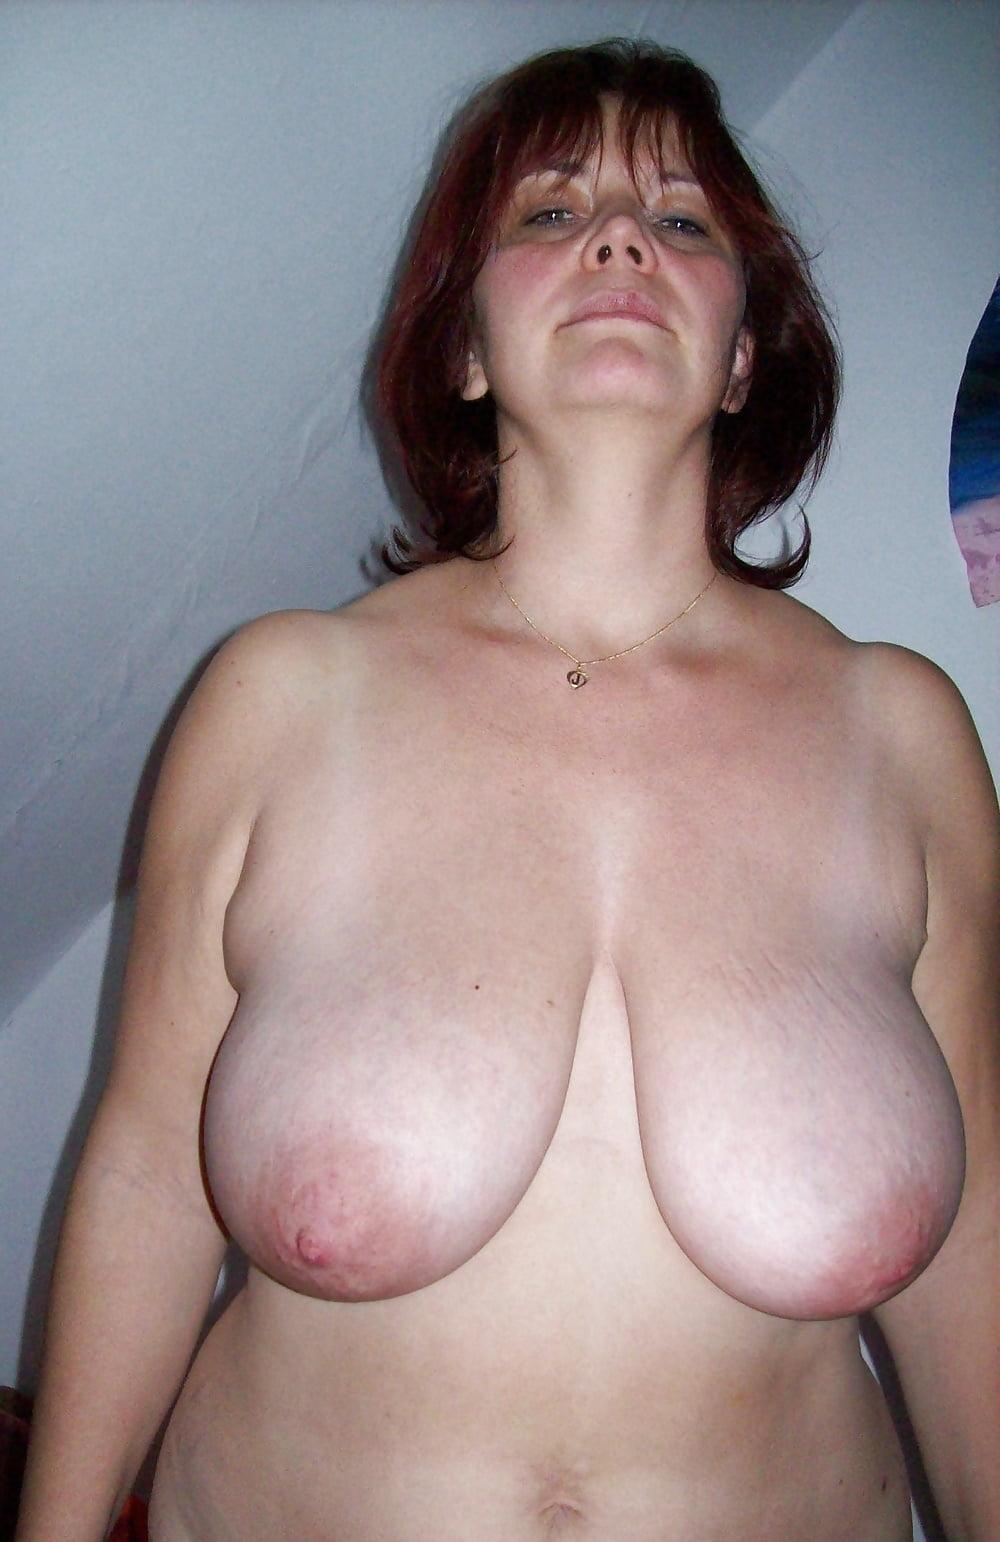 Boobs mature nude pics, women porn photos